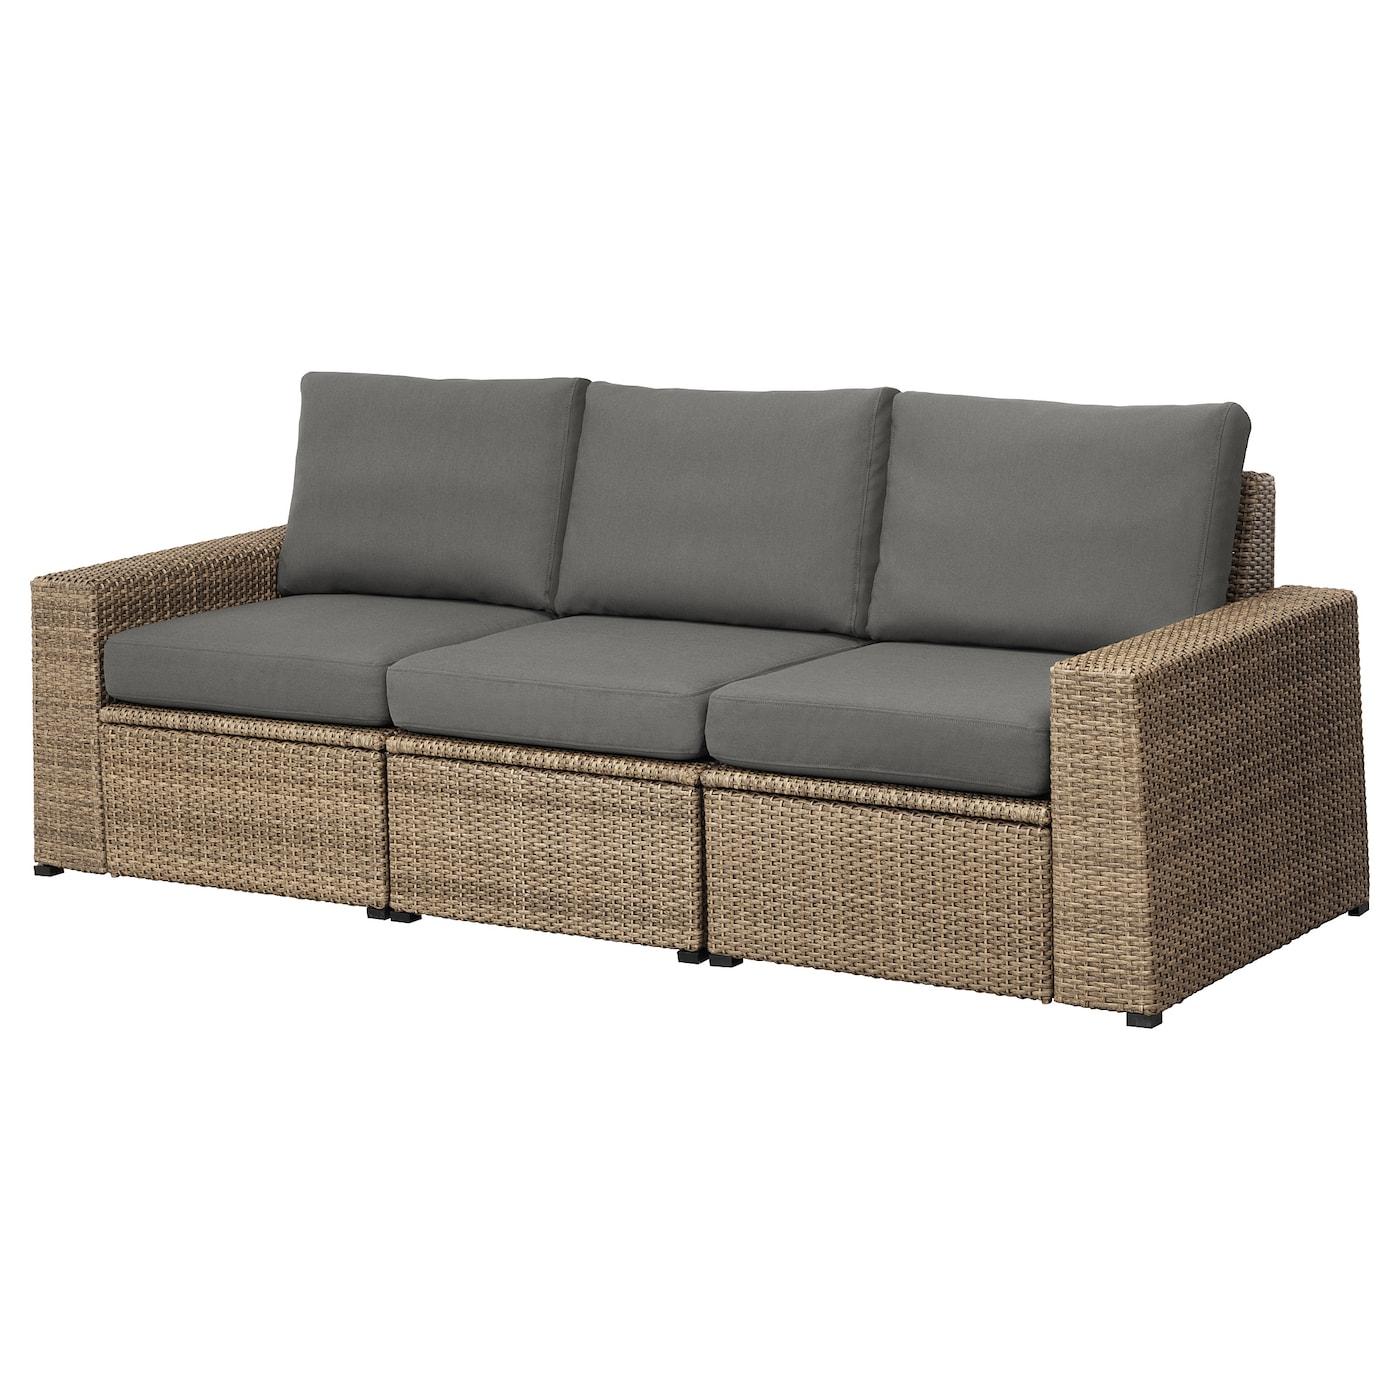 SOLLERÖN 3-seat Modular Sofa, Outdoor Brown/frösön